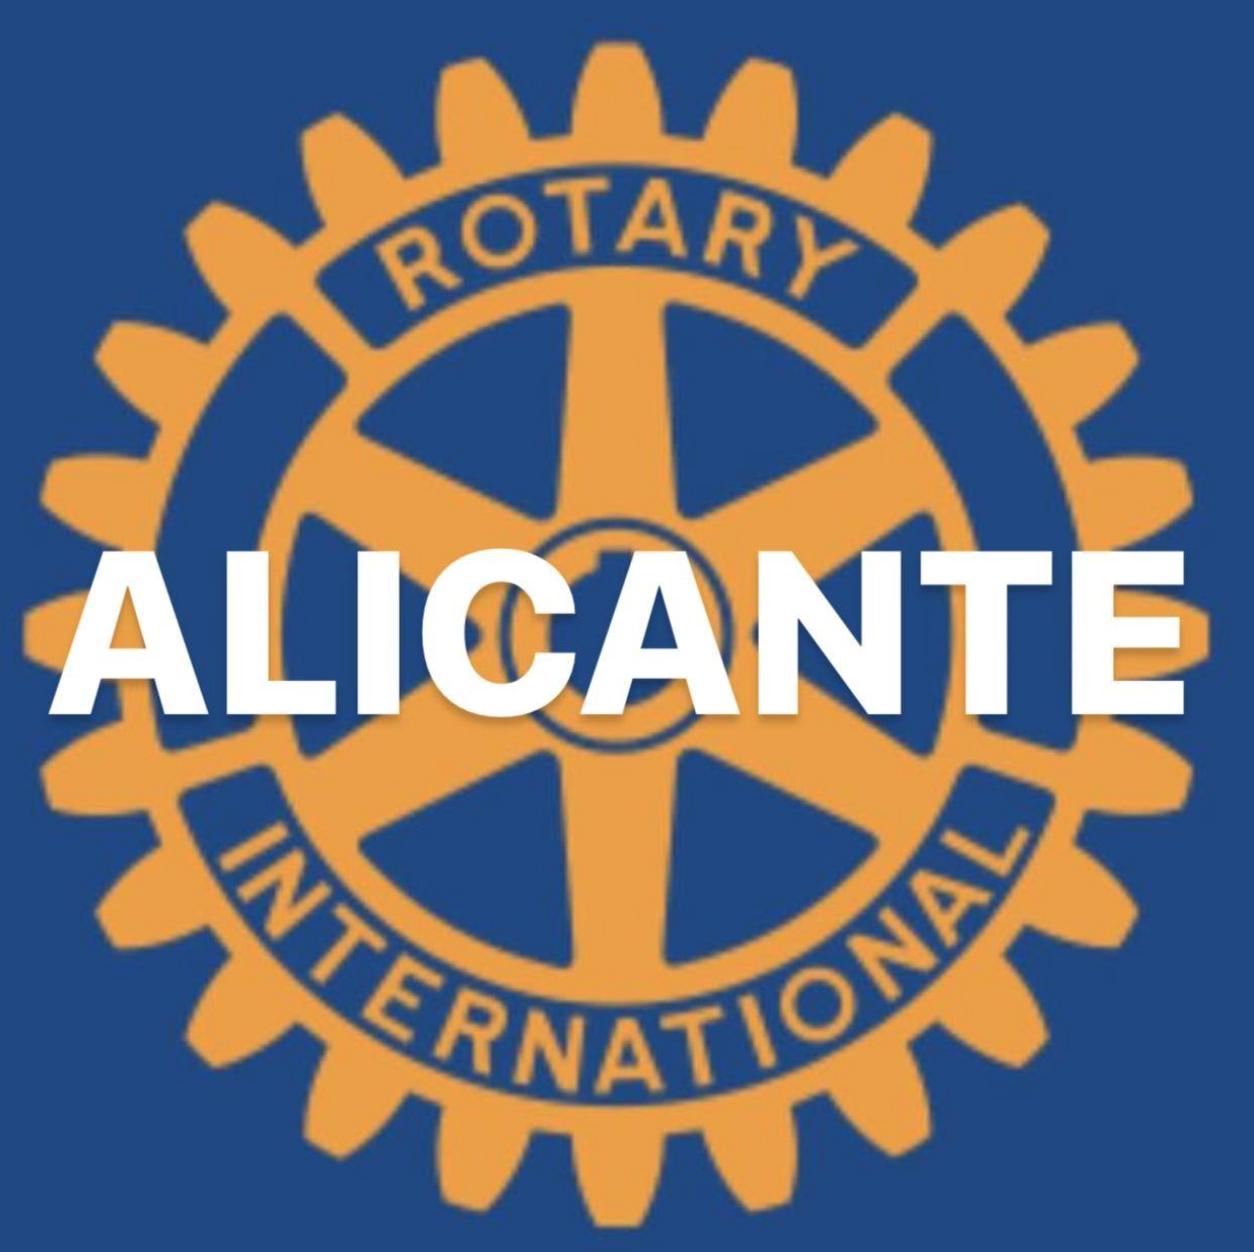 rotary club lucentum alicante